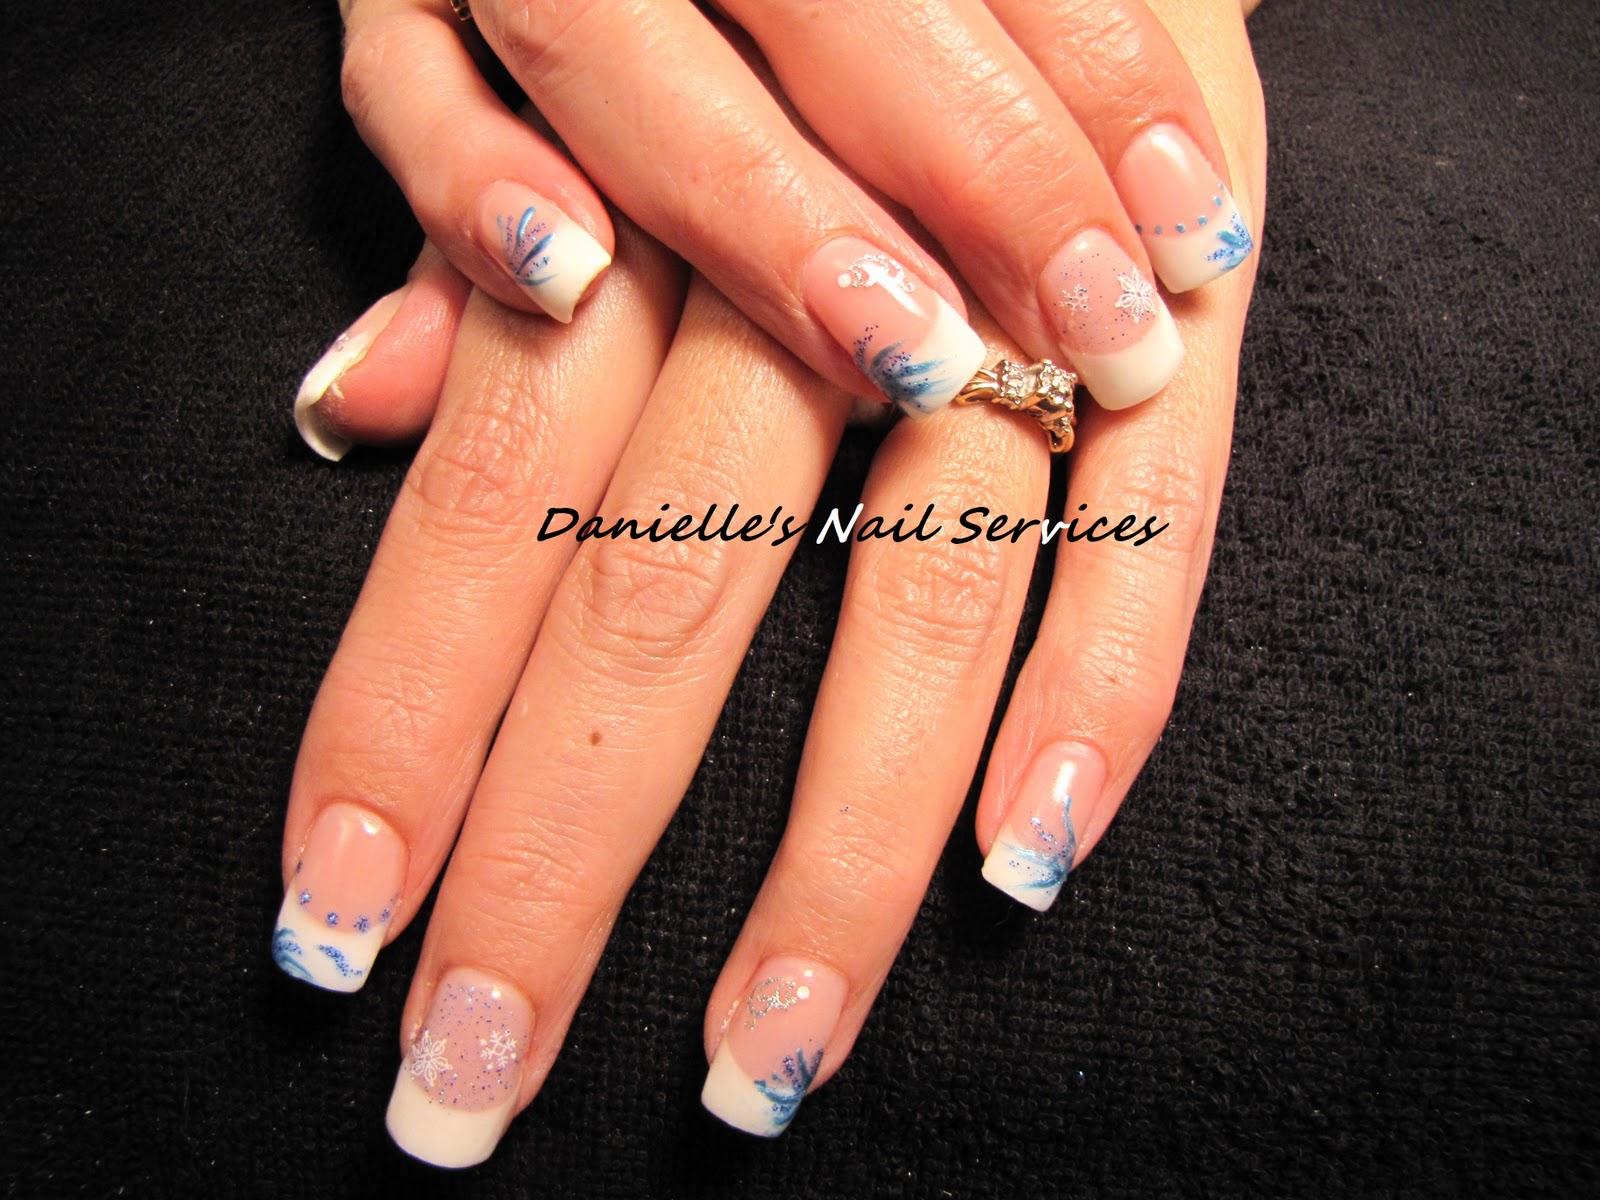 Danielle's Nail Services: November 27th, 2011 - Exam Nails ...